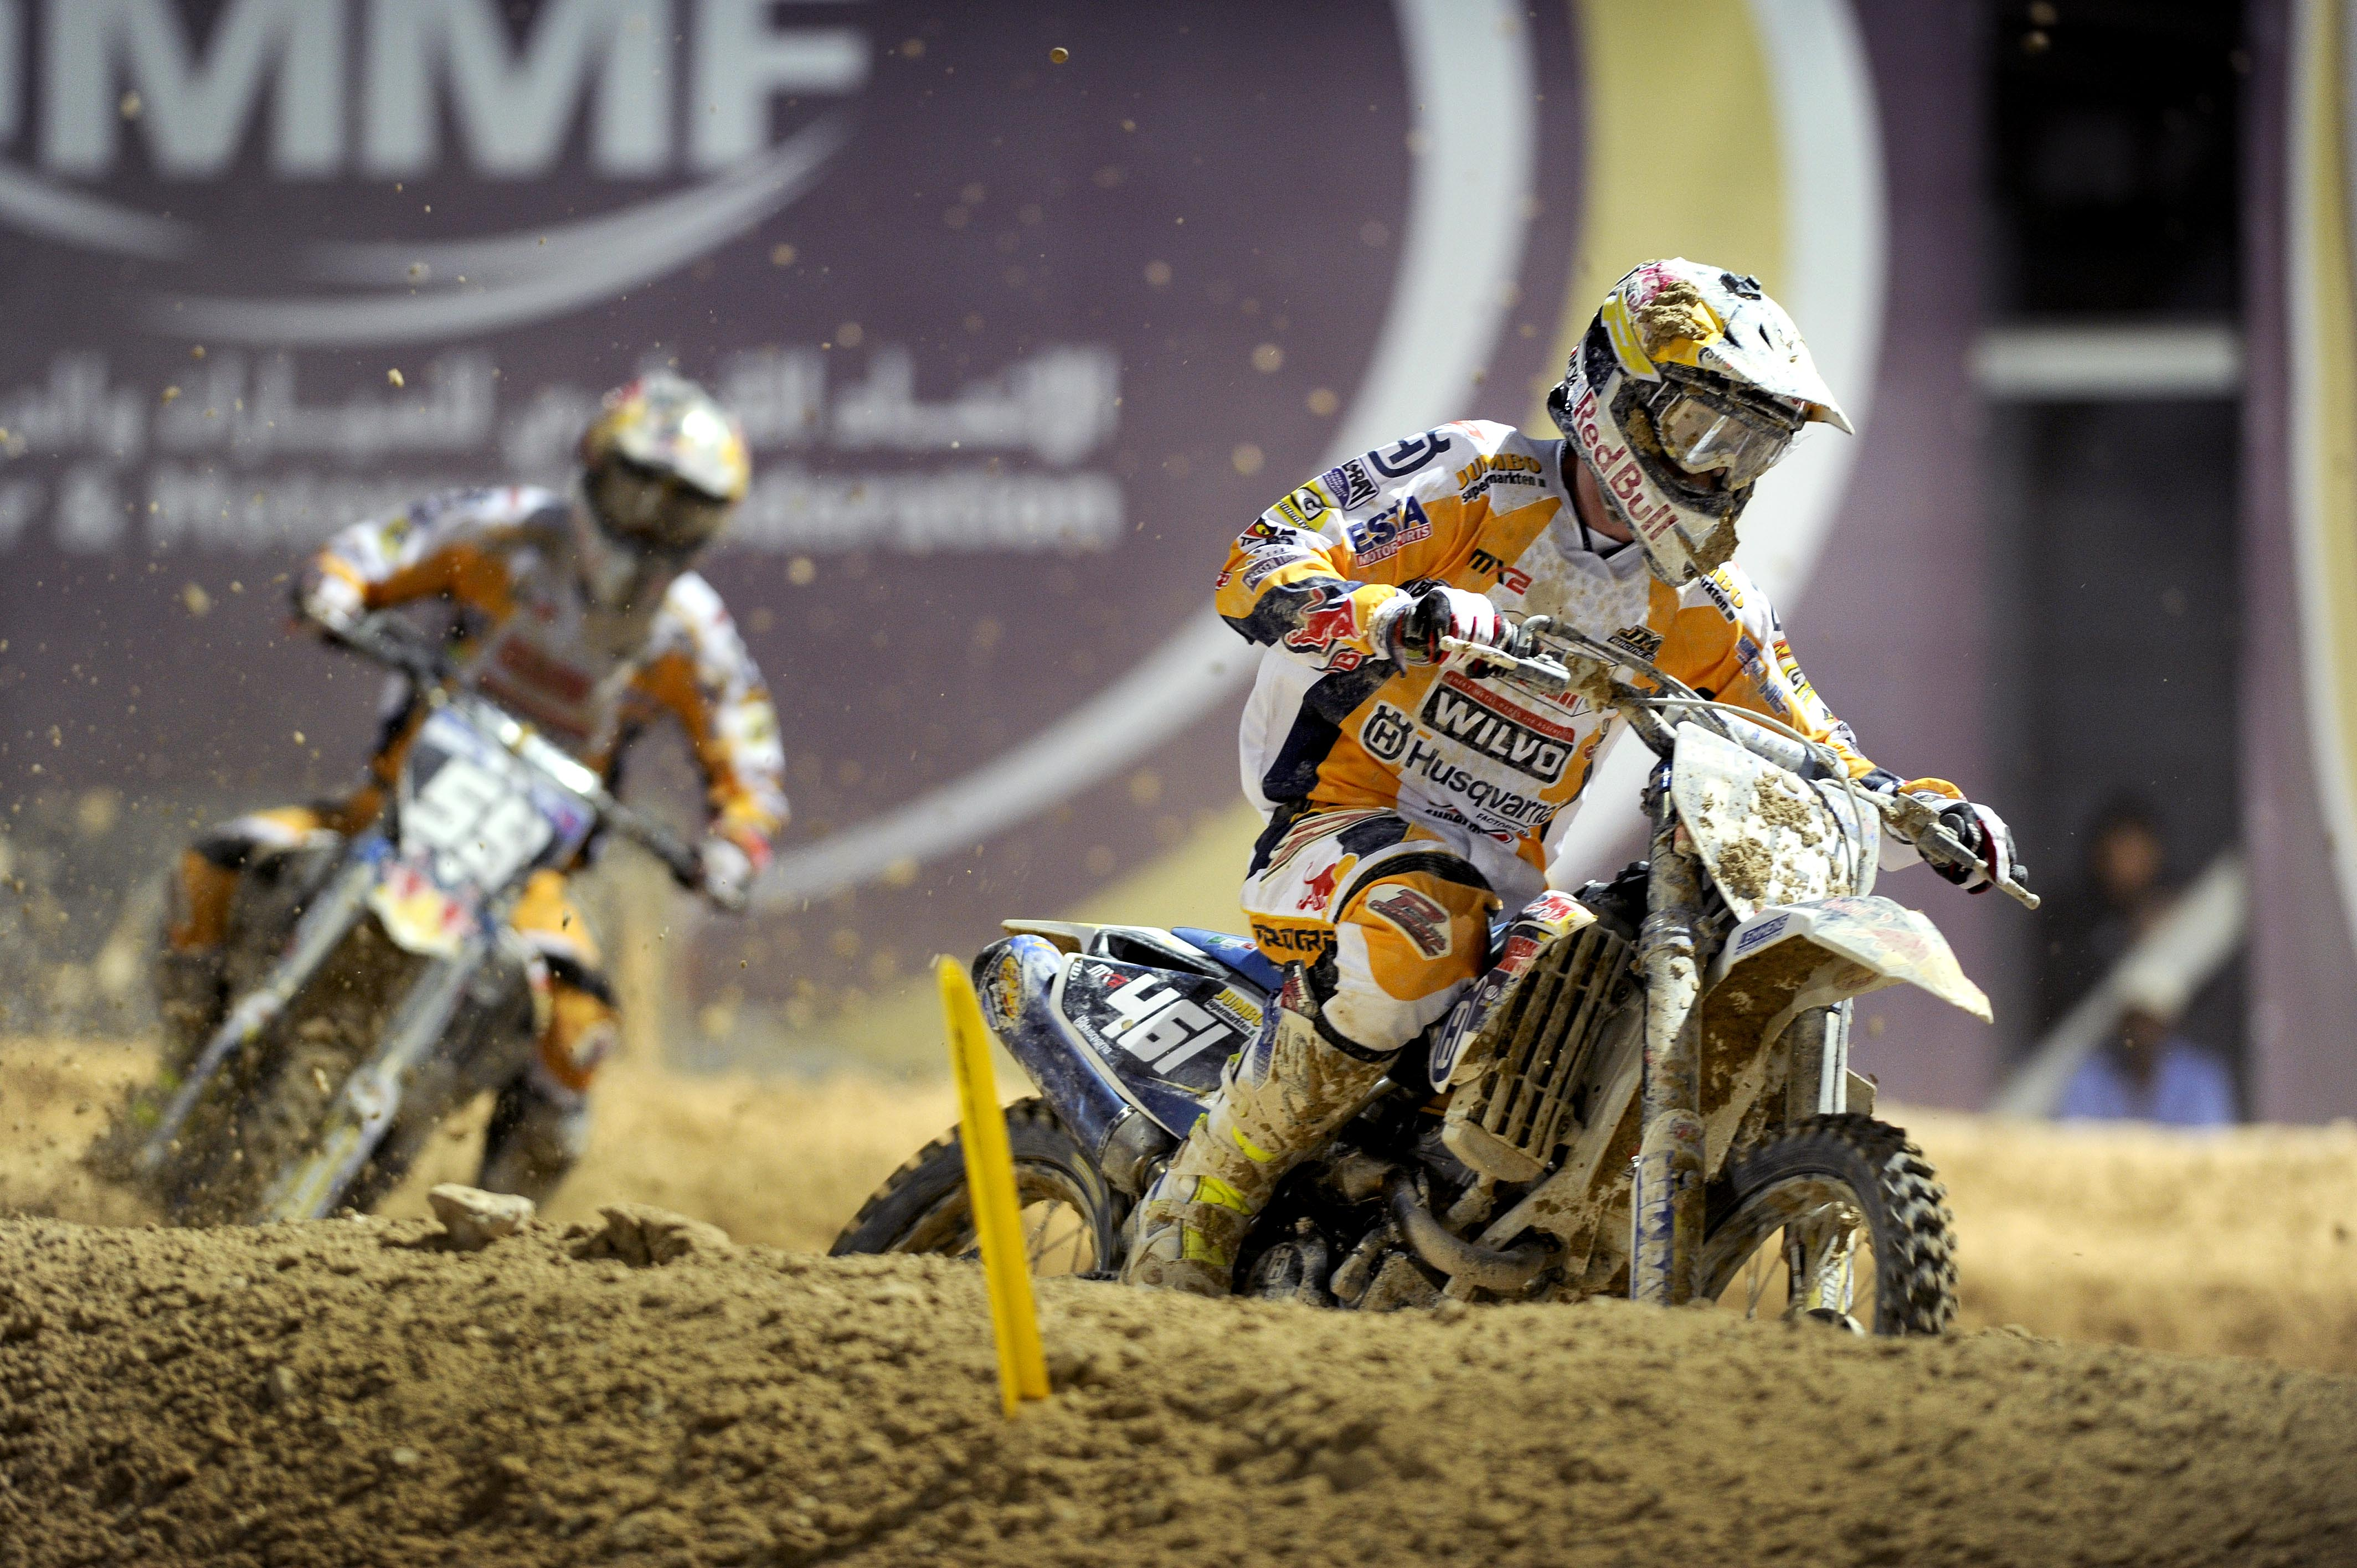 Husqvarna JM Racing Team on stage in Qatar | Sponsorship